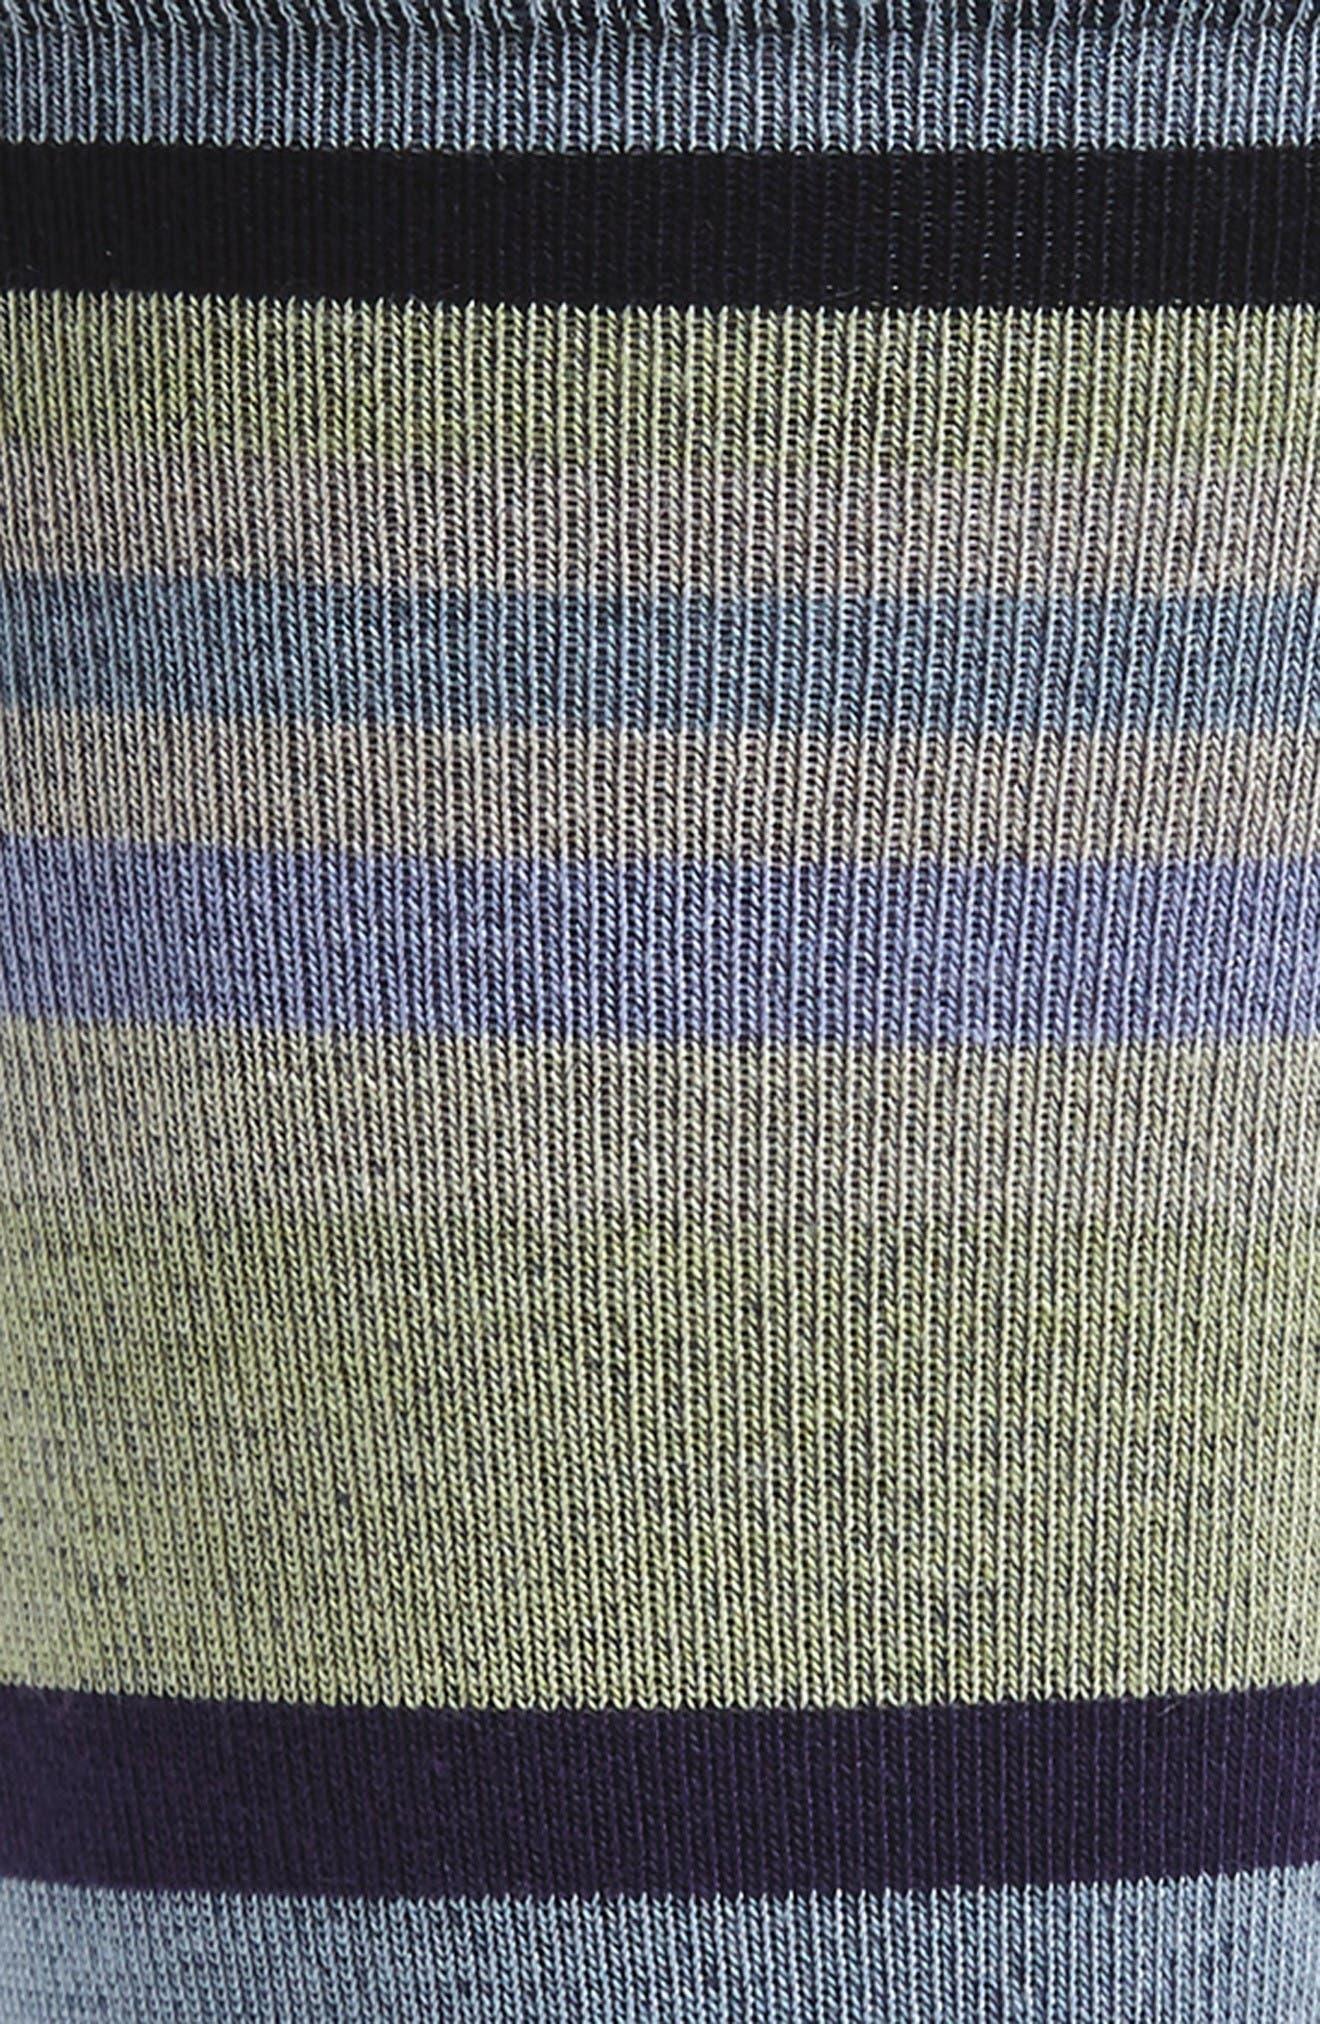 Reserve Worth Socks,                             Alternate thumbnail 2, color,                             Purple/ Black